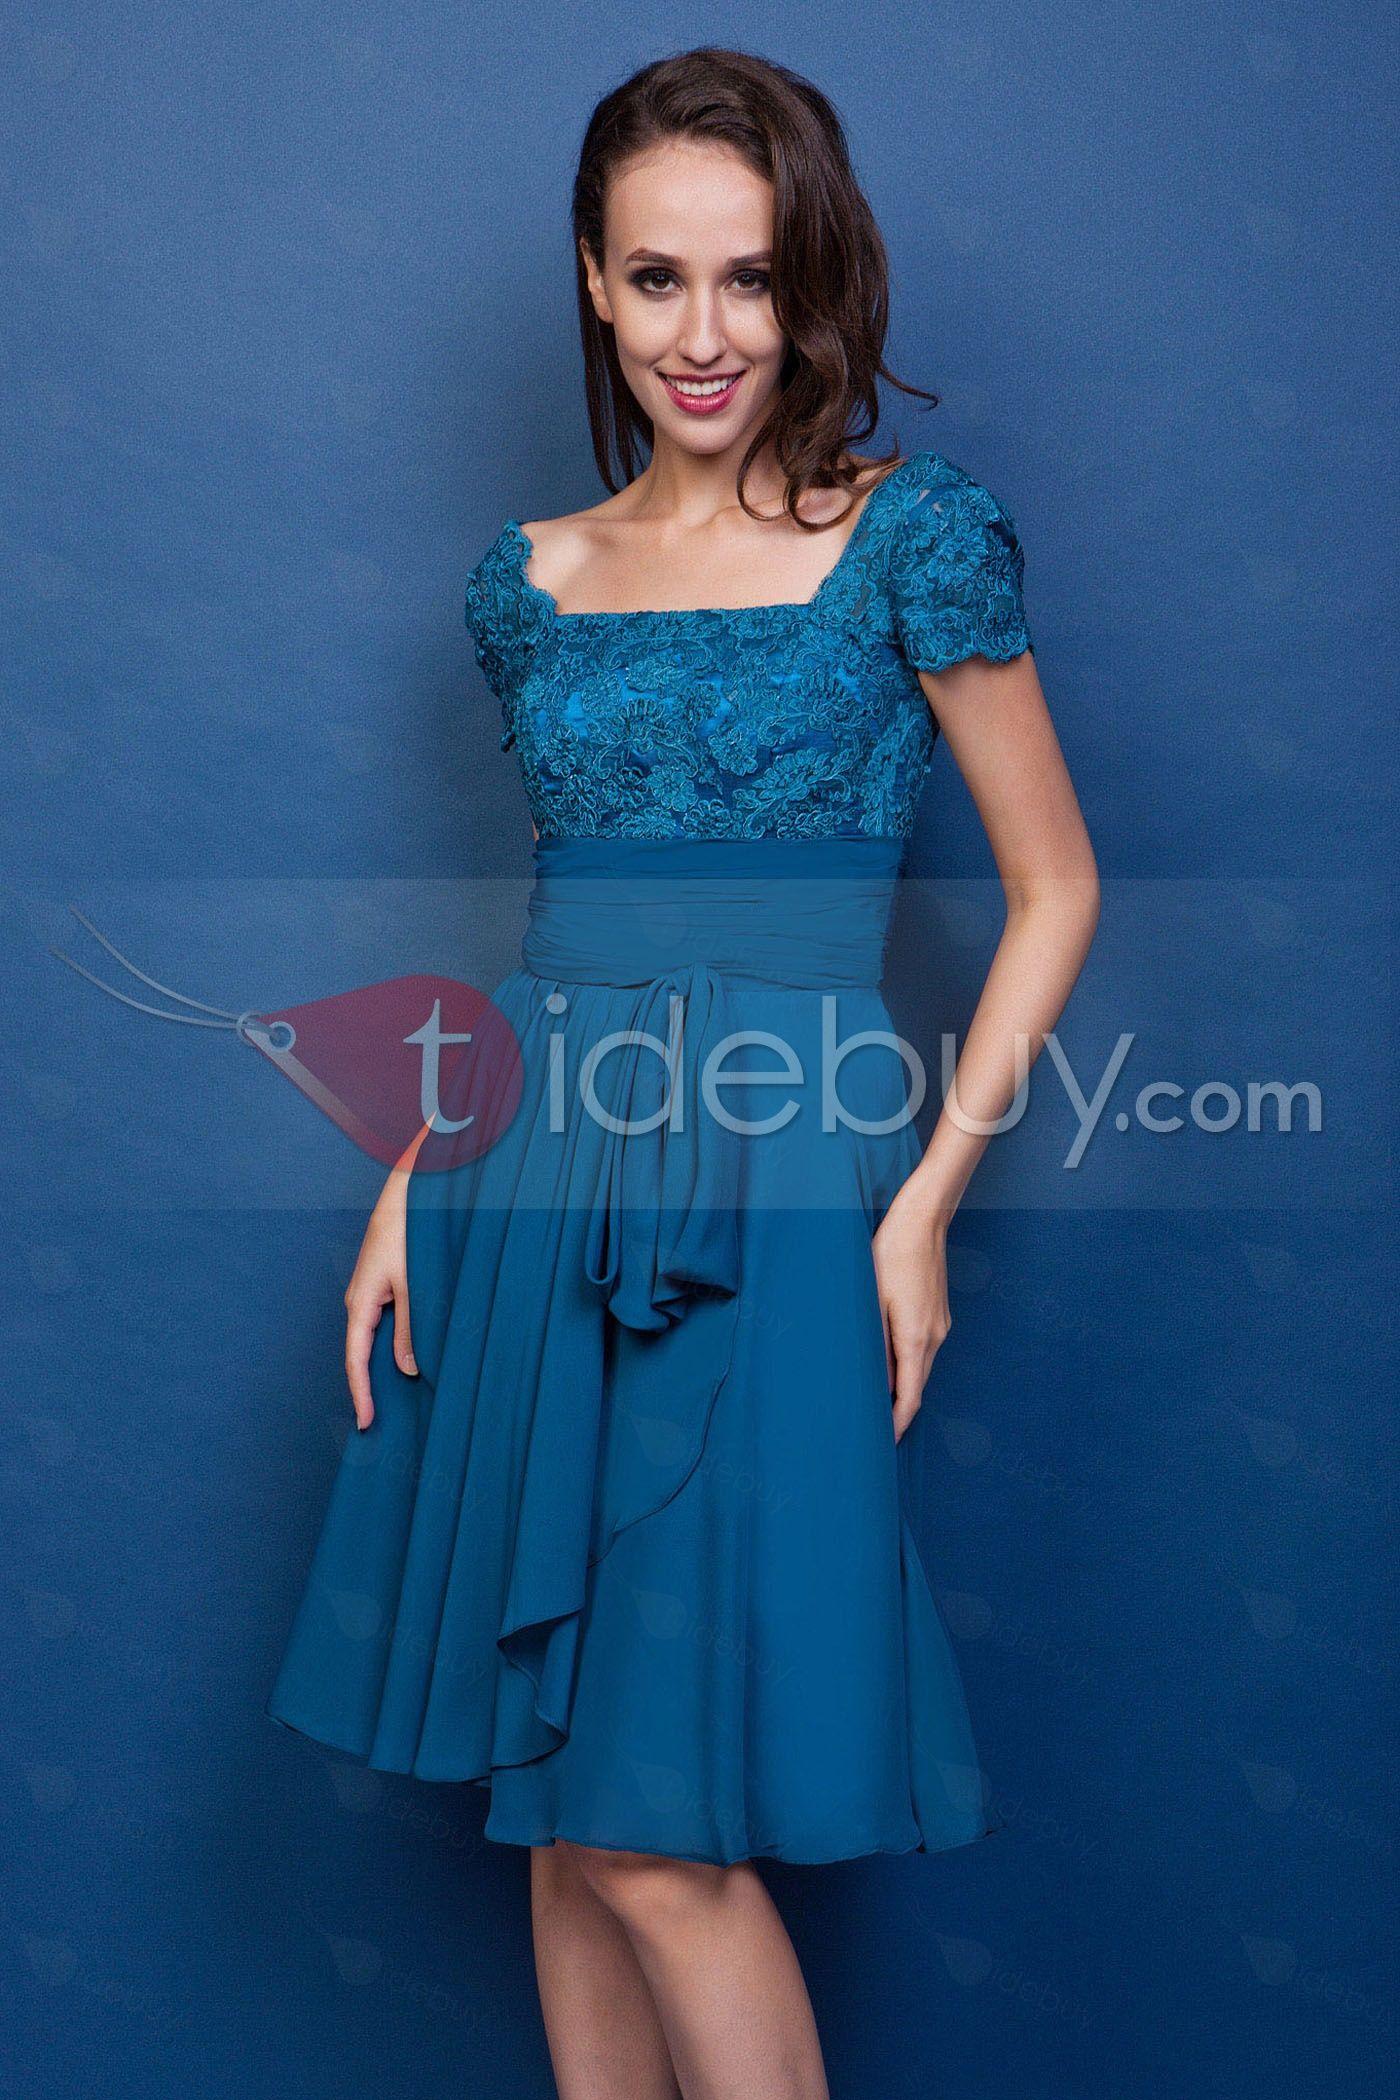 Vestidos de fiesta ala rodilla 2014